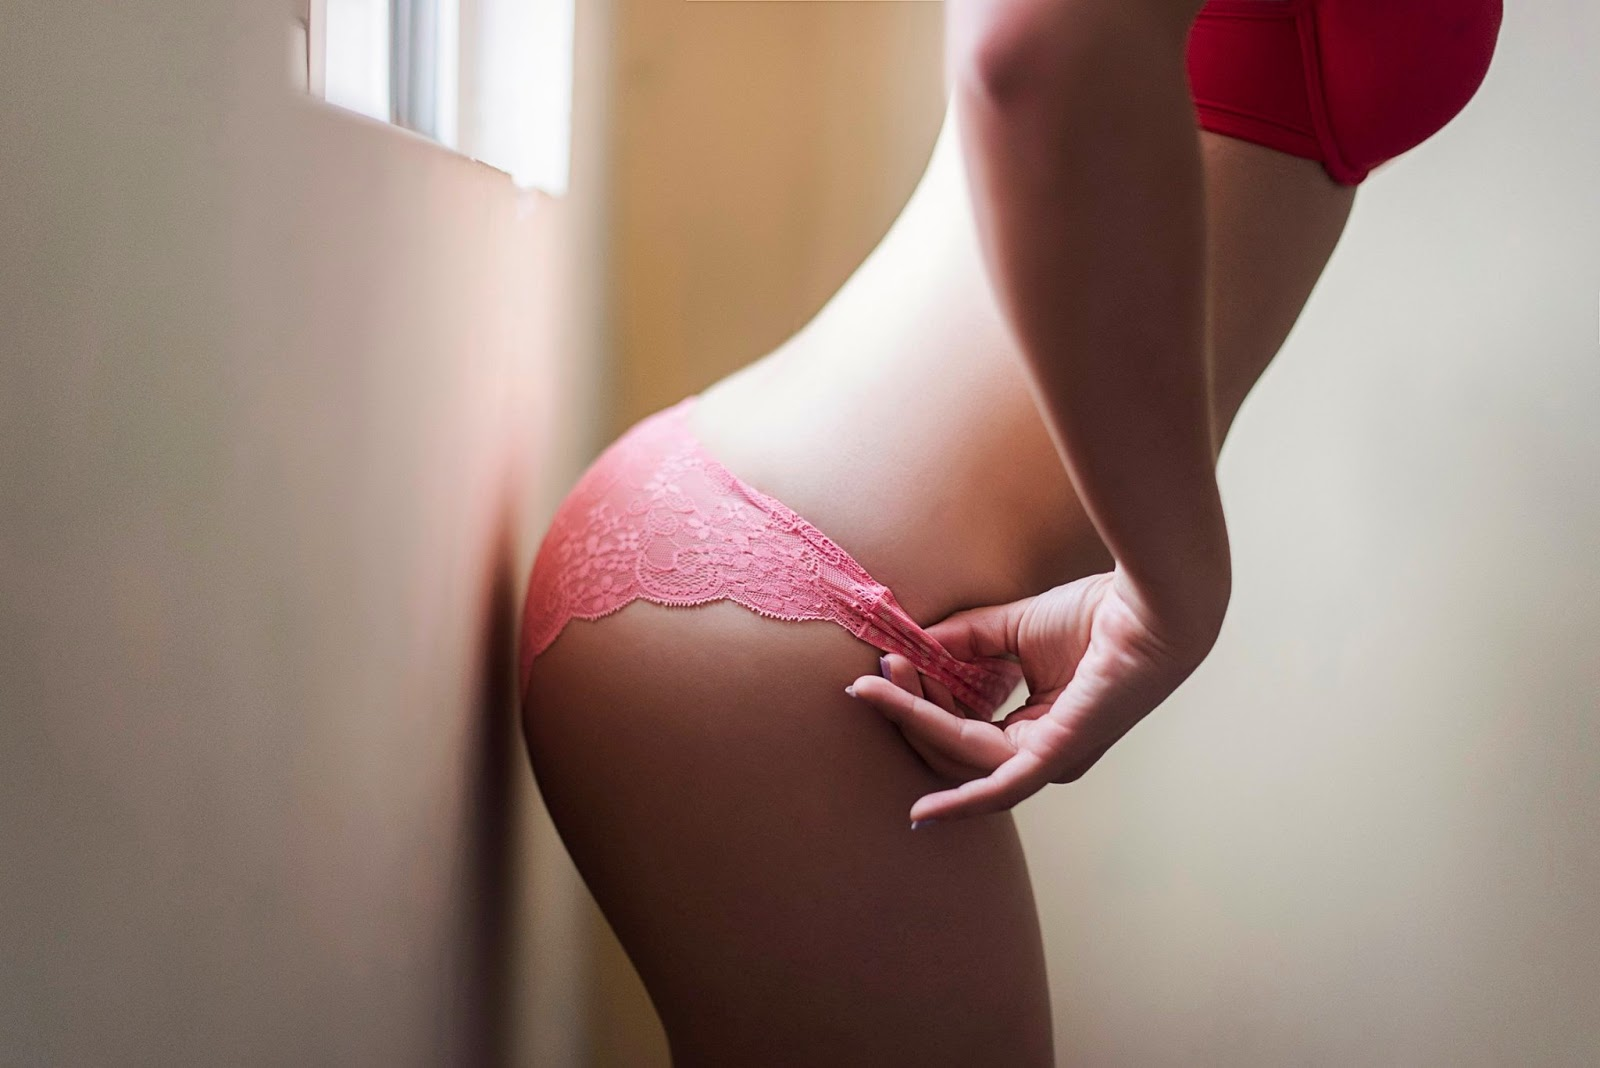 Negro Con Flaquita Latina Porno Castellano julio 2014 | revista sputnik